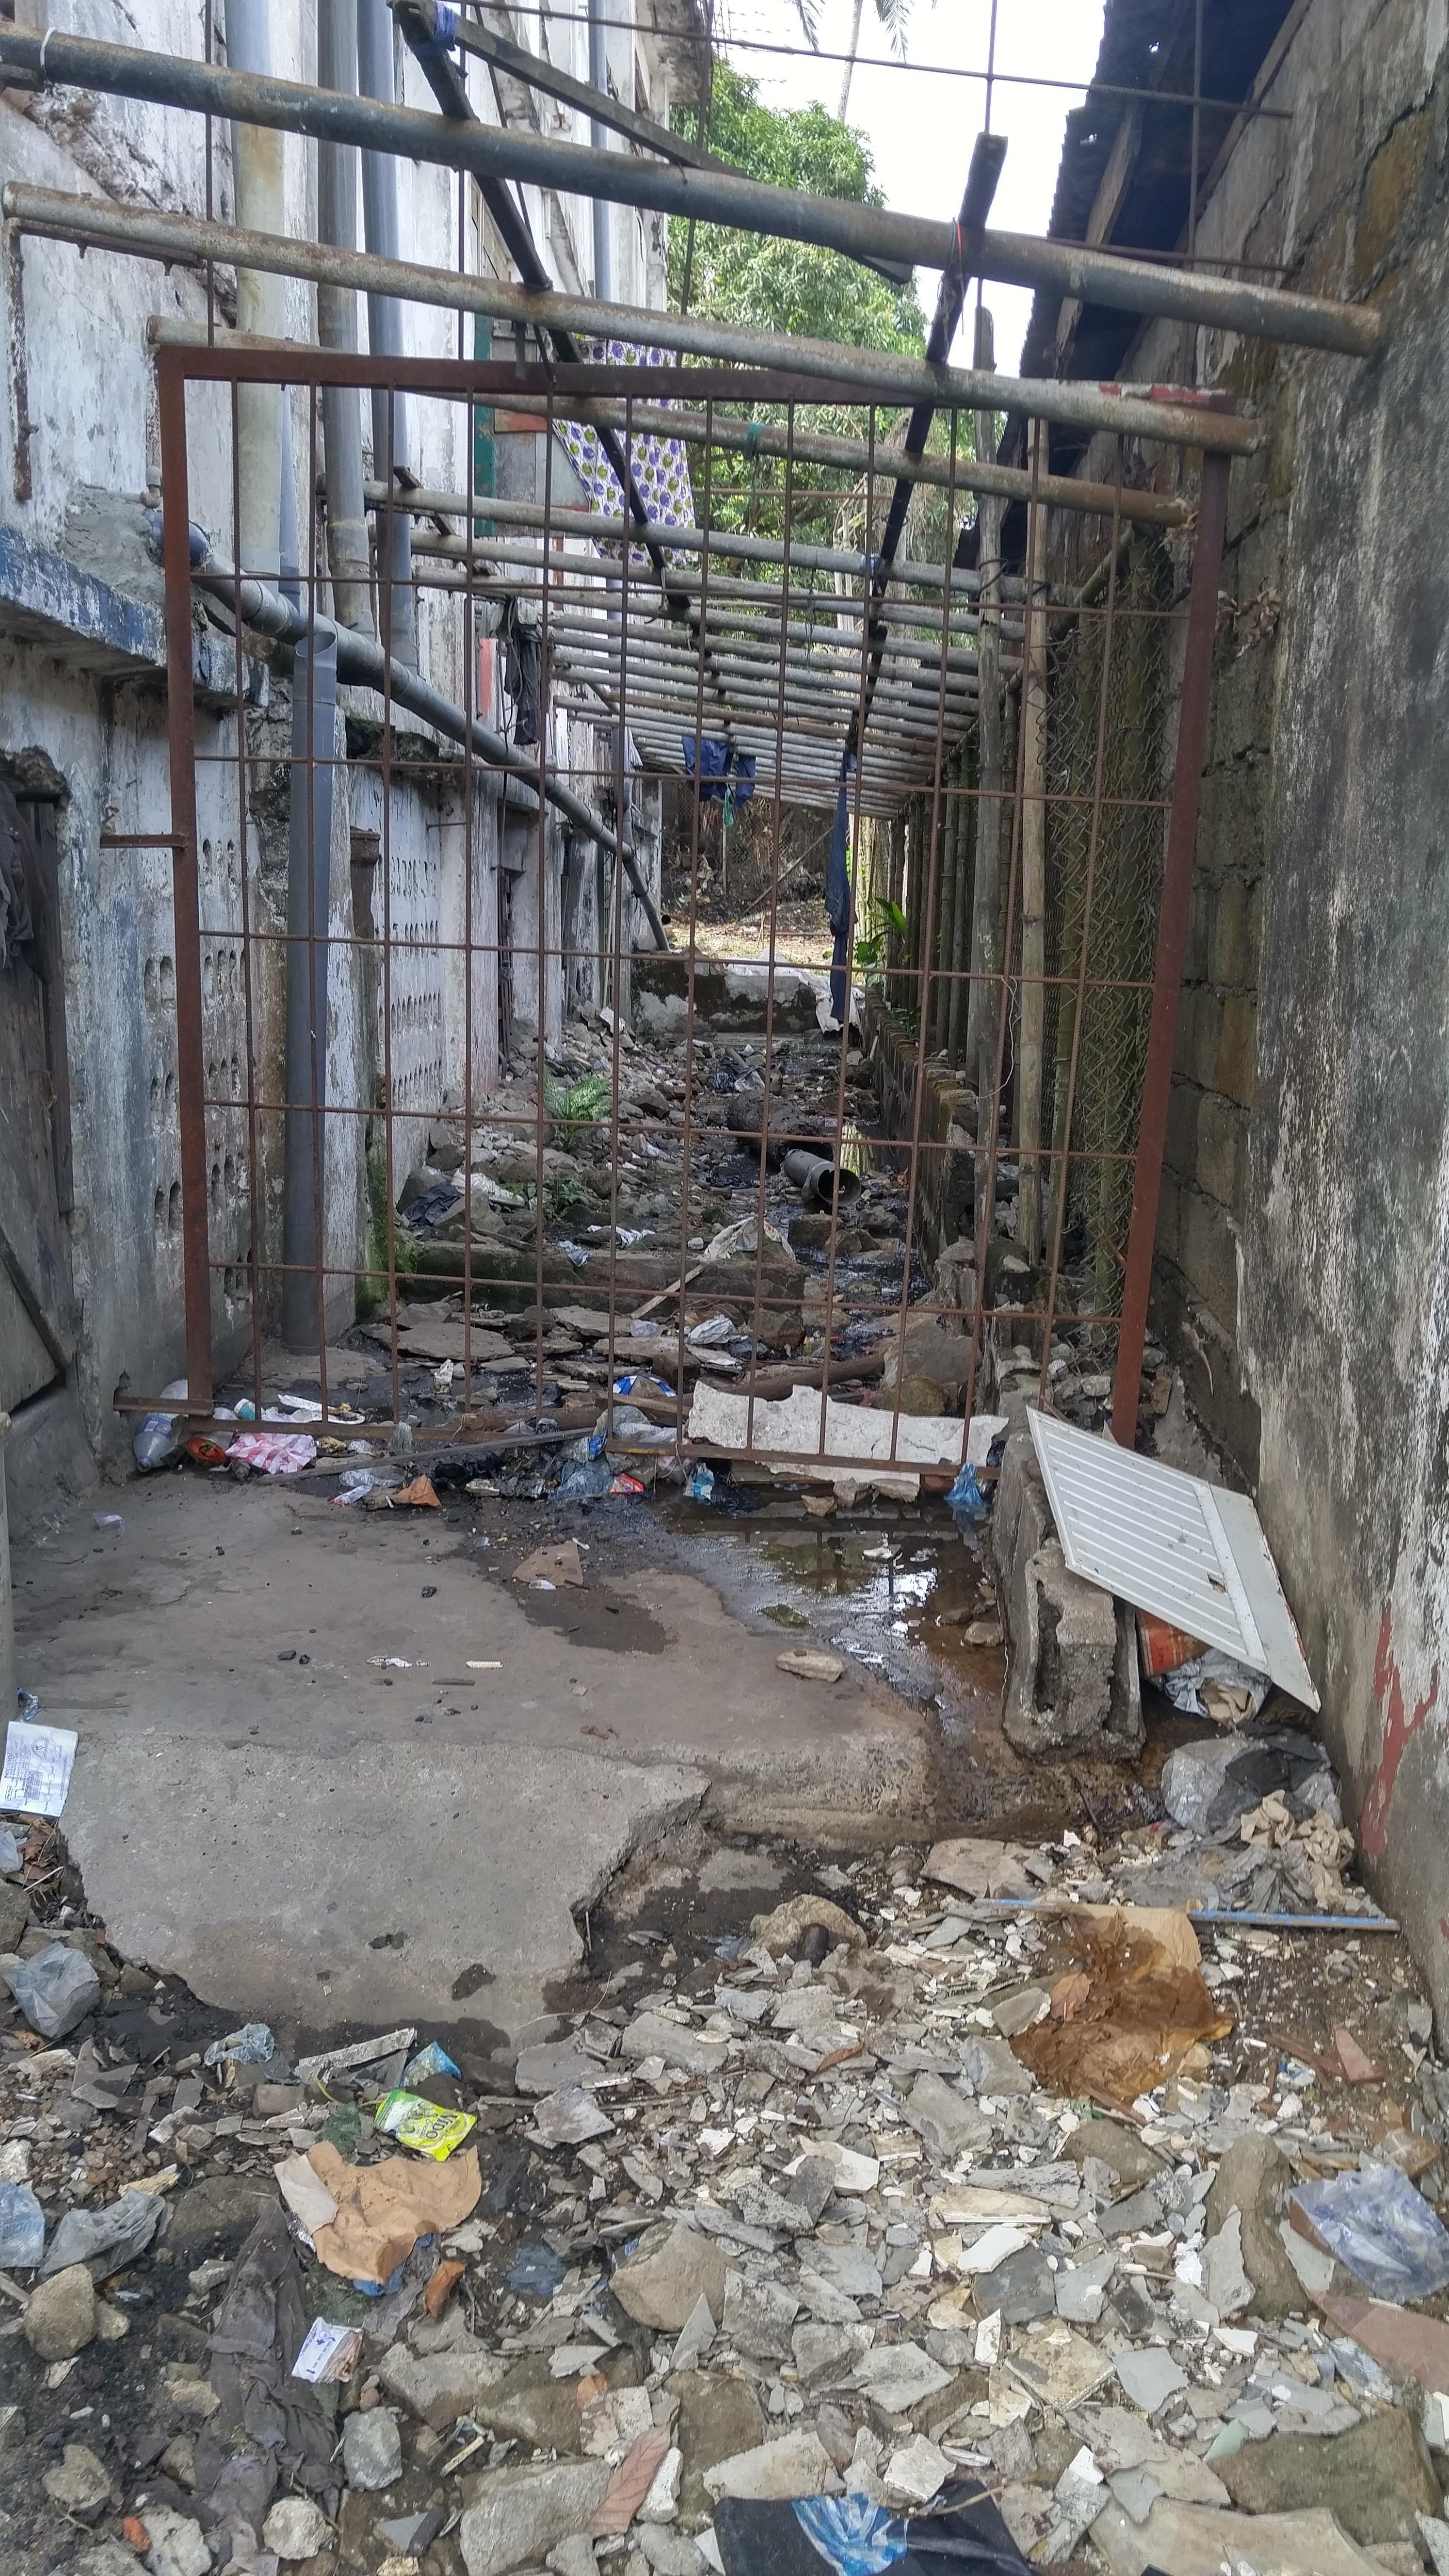 An alleyway of Monrovia Liberia в 2020 г